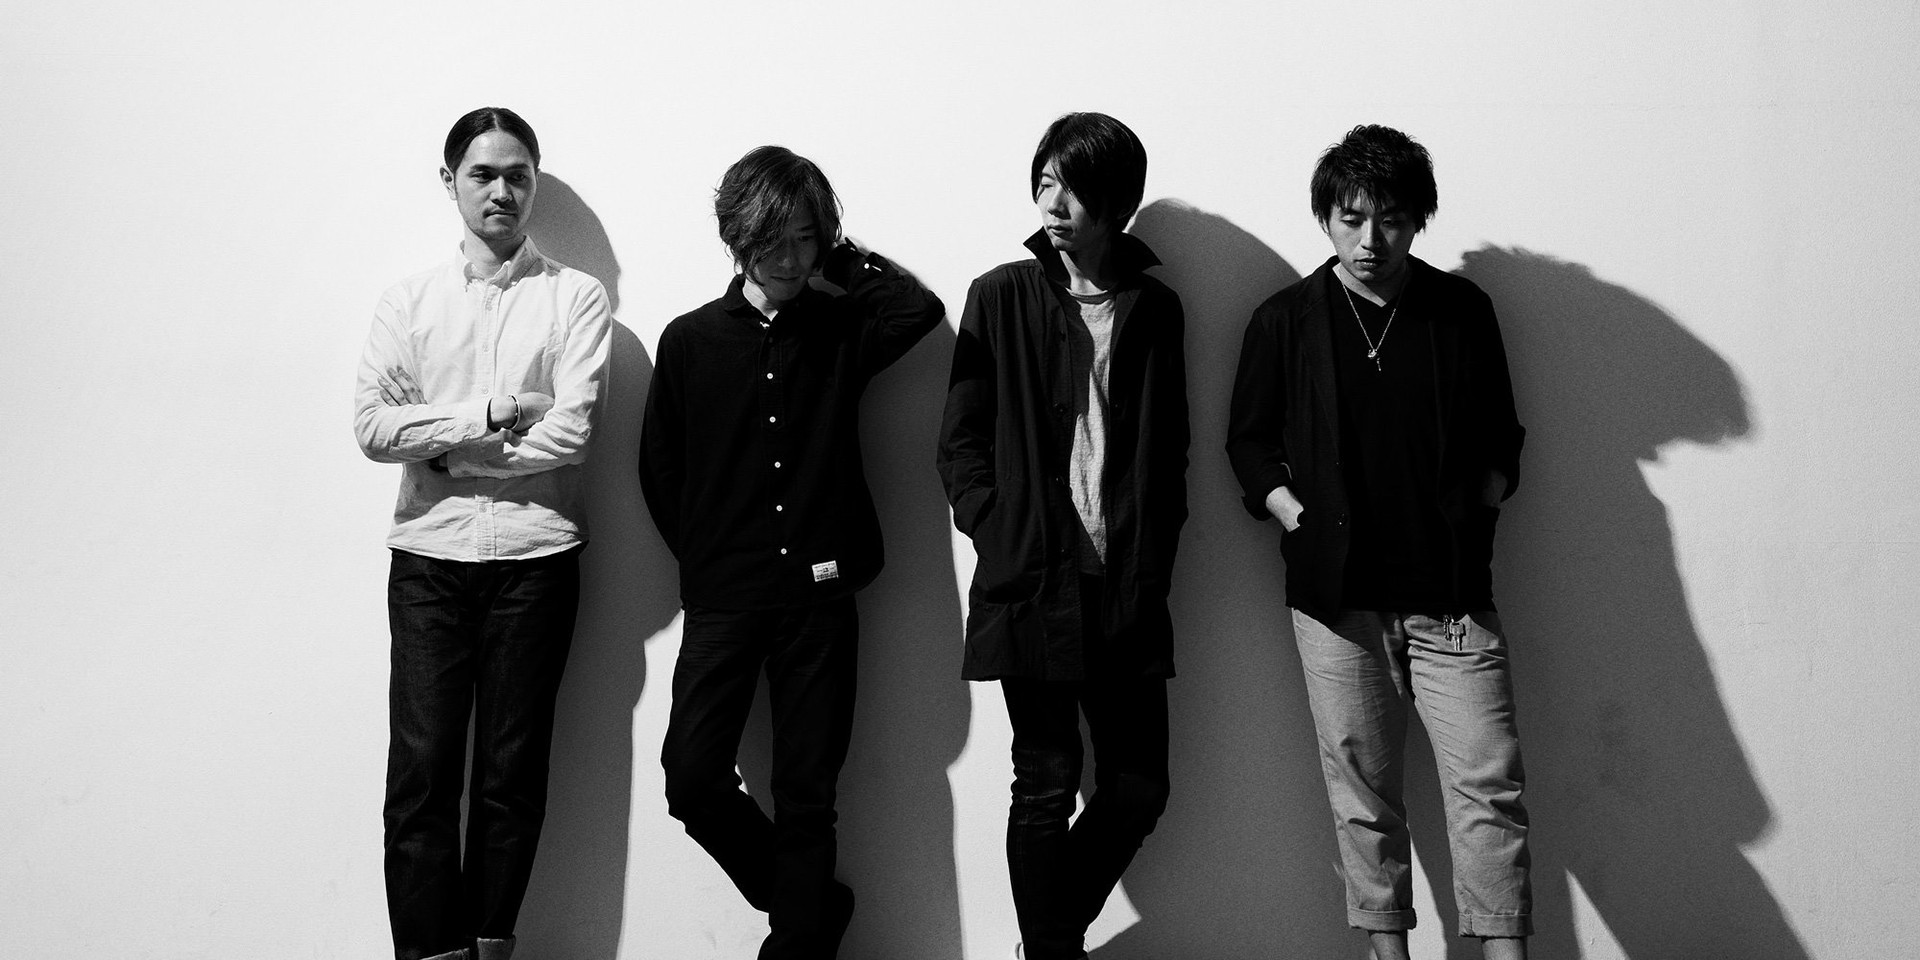 Japanese instrumental rock quartet LITE to make their Manila debut in headlining concert with Terno Recordings